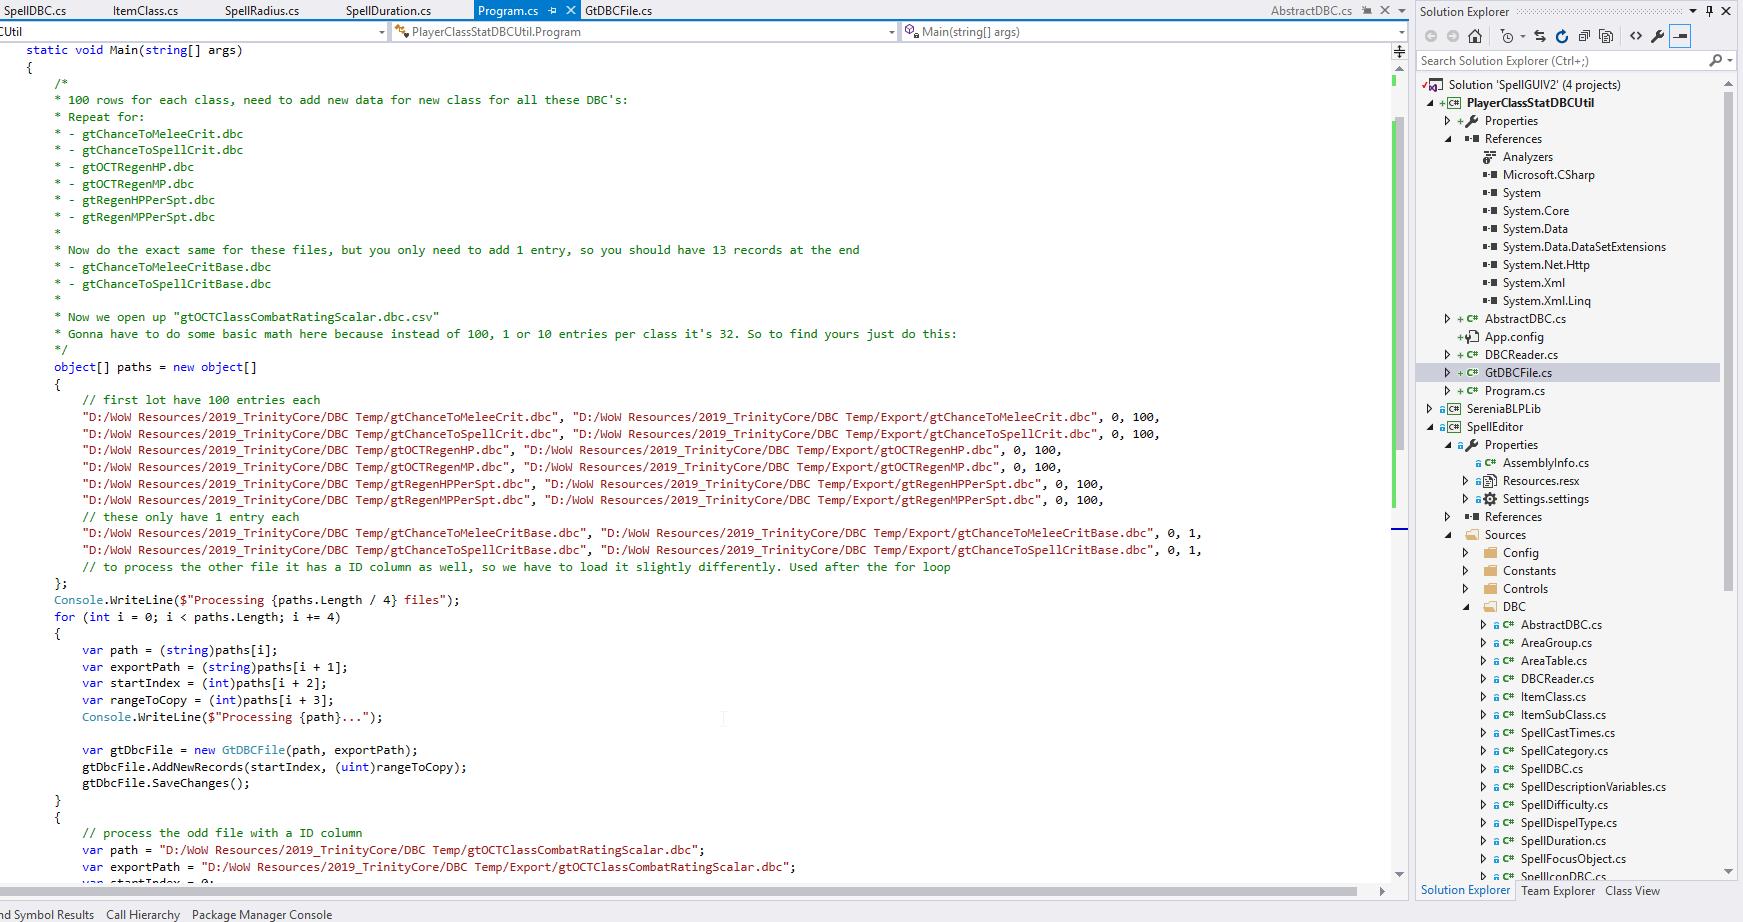 Screenshot of program code for adding gt DBC data